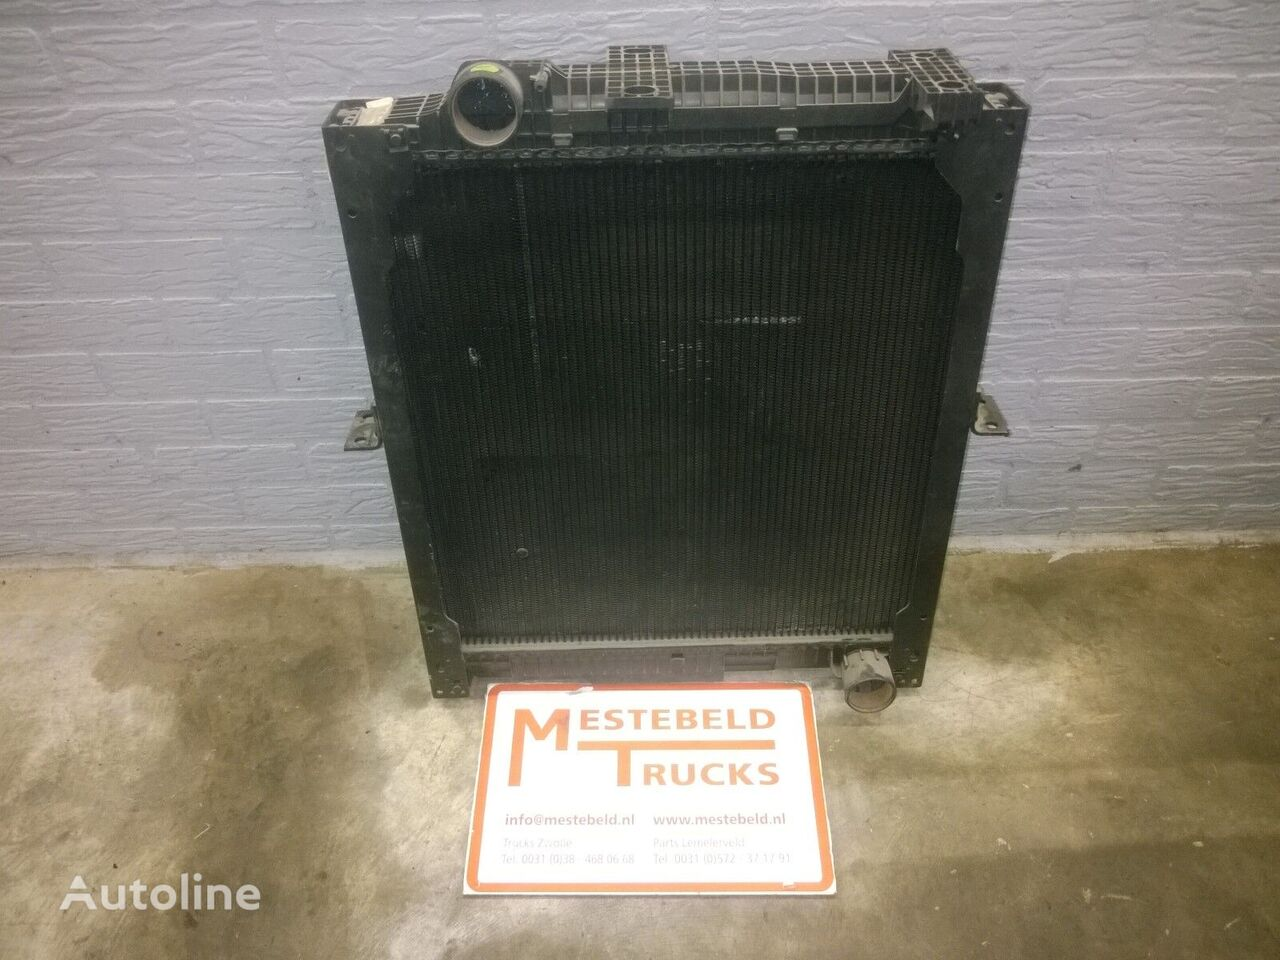 MERCEDES-BENZ engine cooling radiator for MERCEDES-BENZ truck